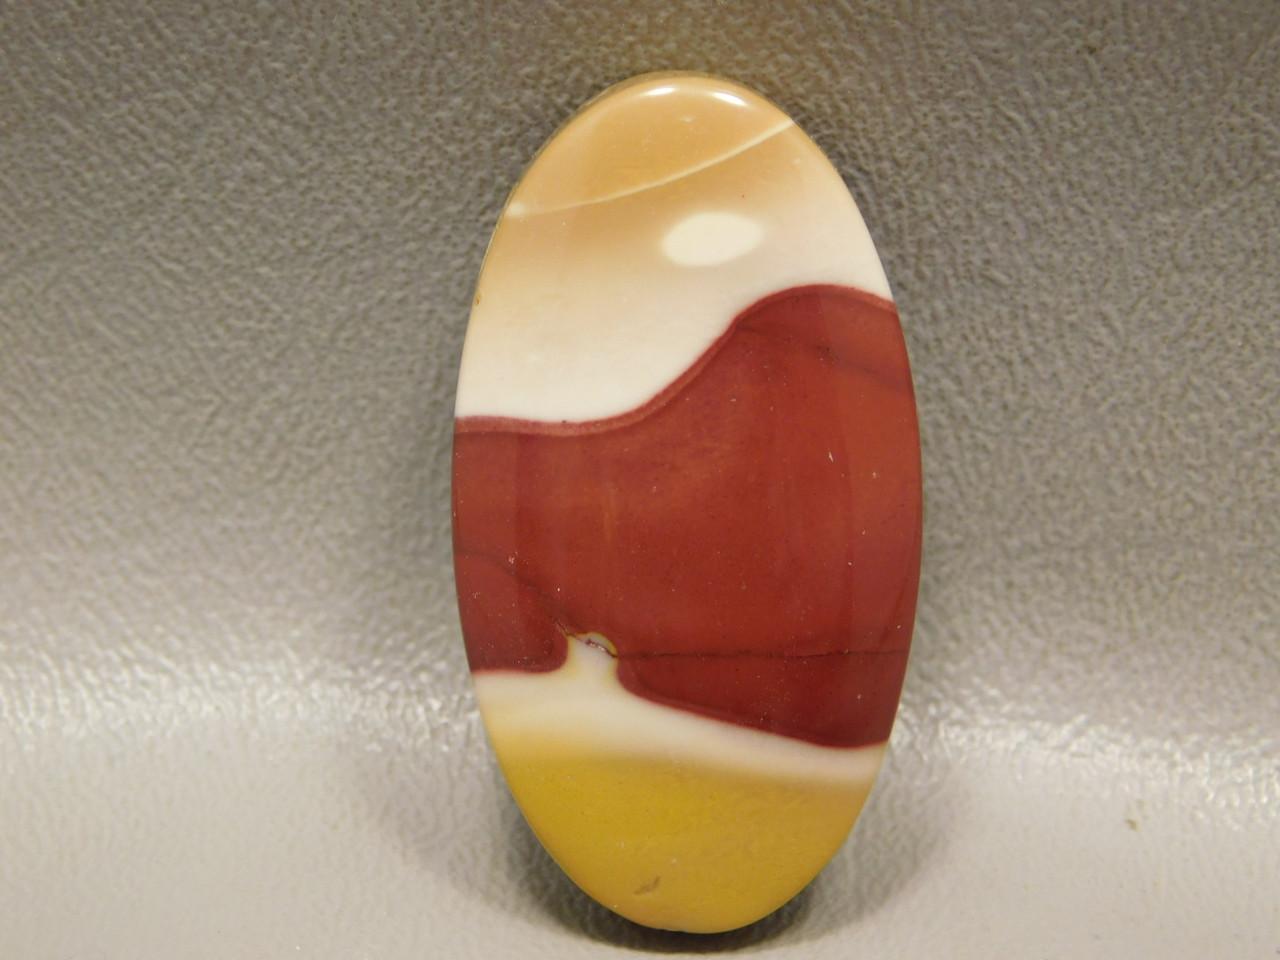 Mookaite Jasper Focal Point Drilled Stone Beading Bead Pendant #10